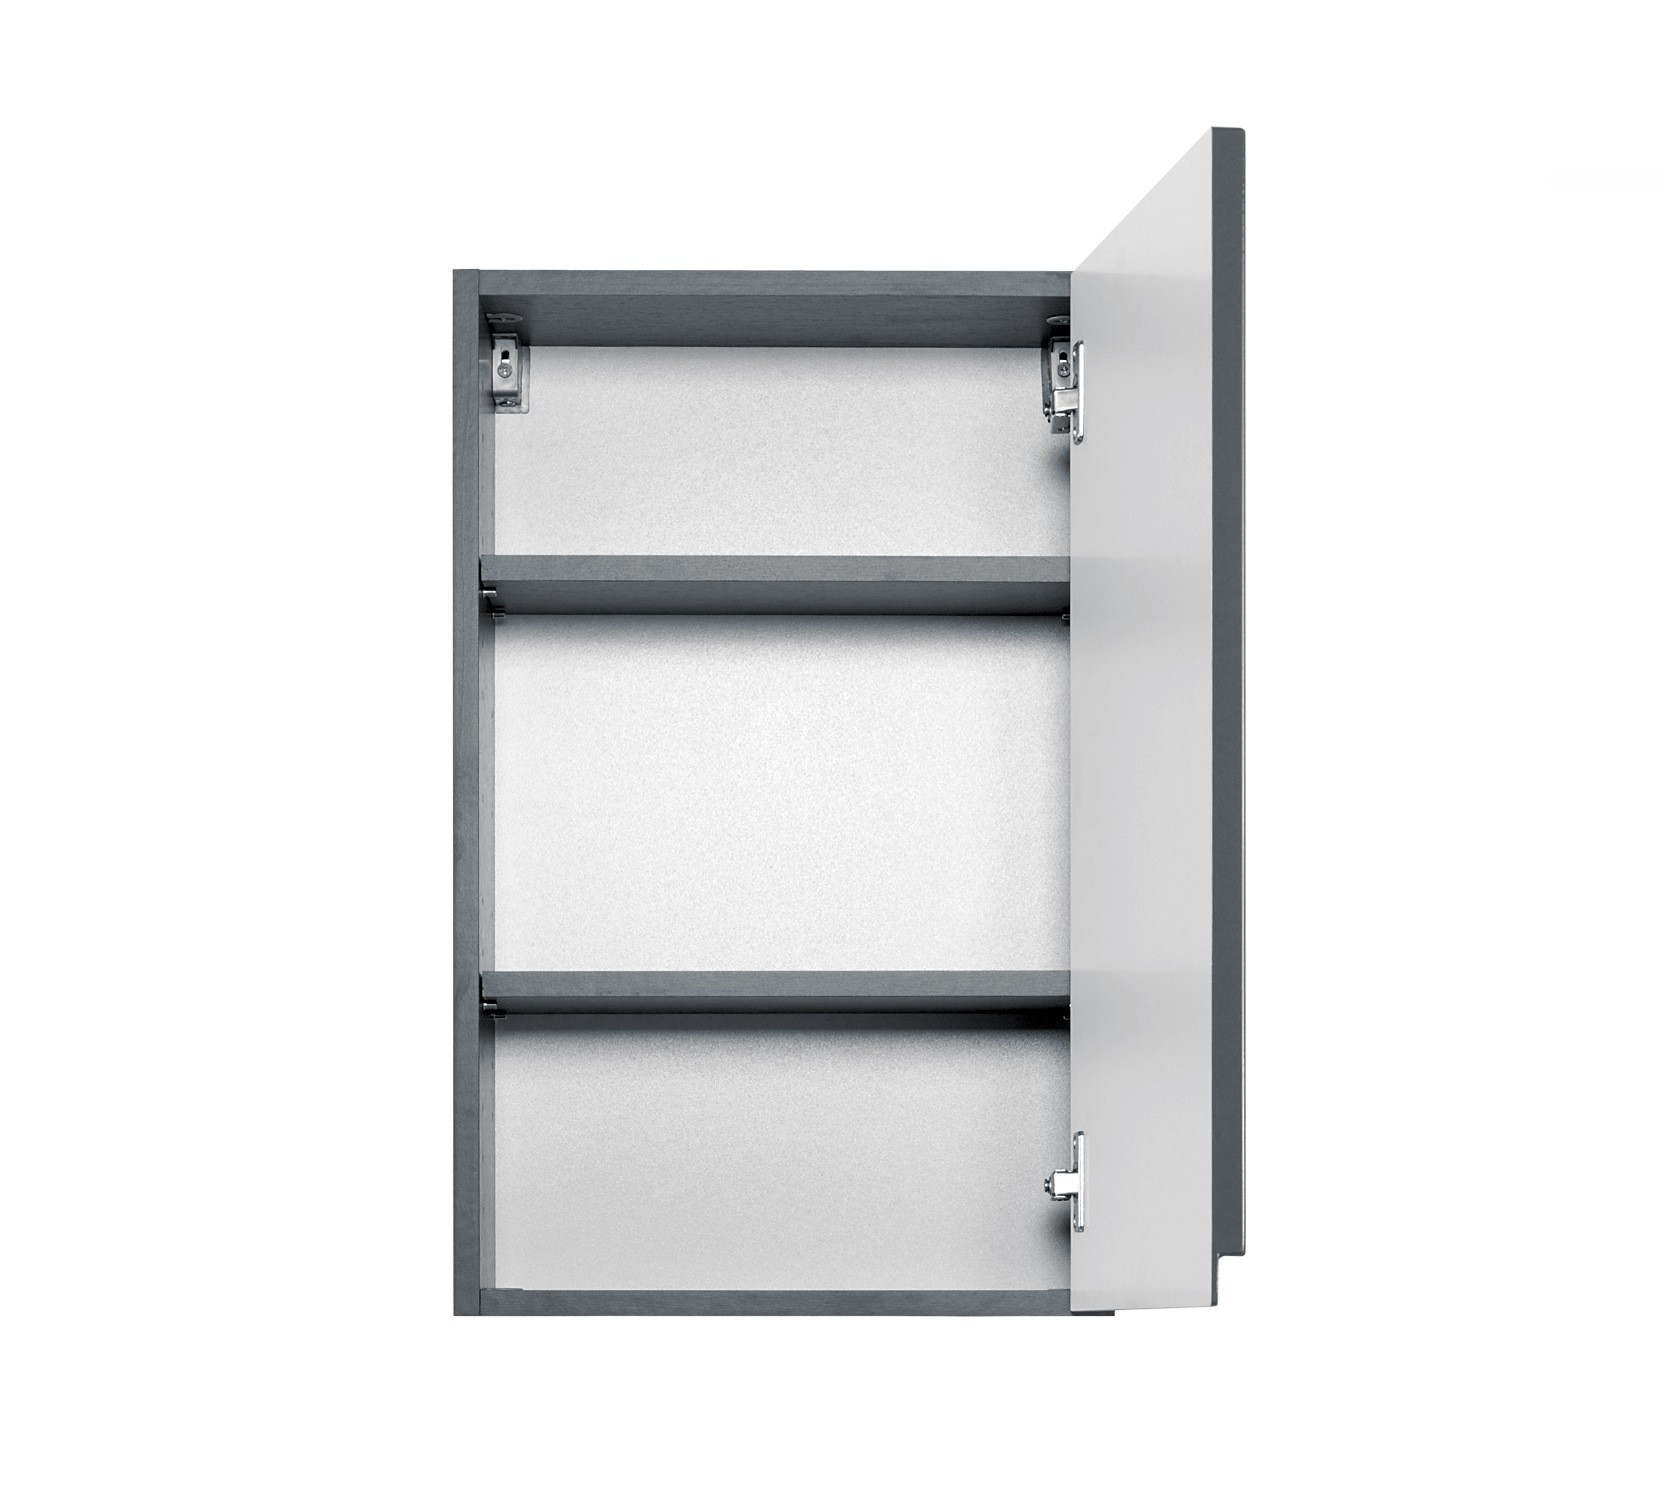 bad h ngeschrank cardiff 1 t rig 40 cm breit hochglanz grau bad cardiff. Black Bedroom Furniture Sets. Home Design Ideas